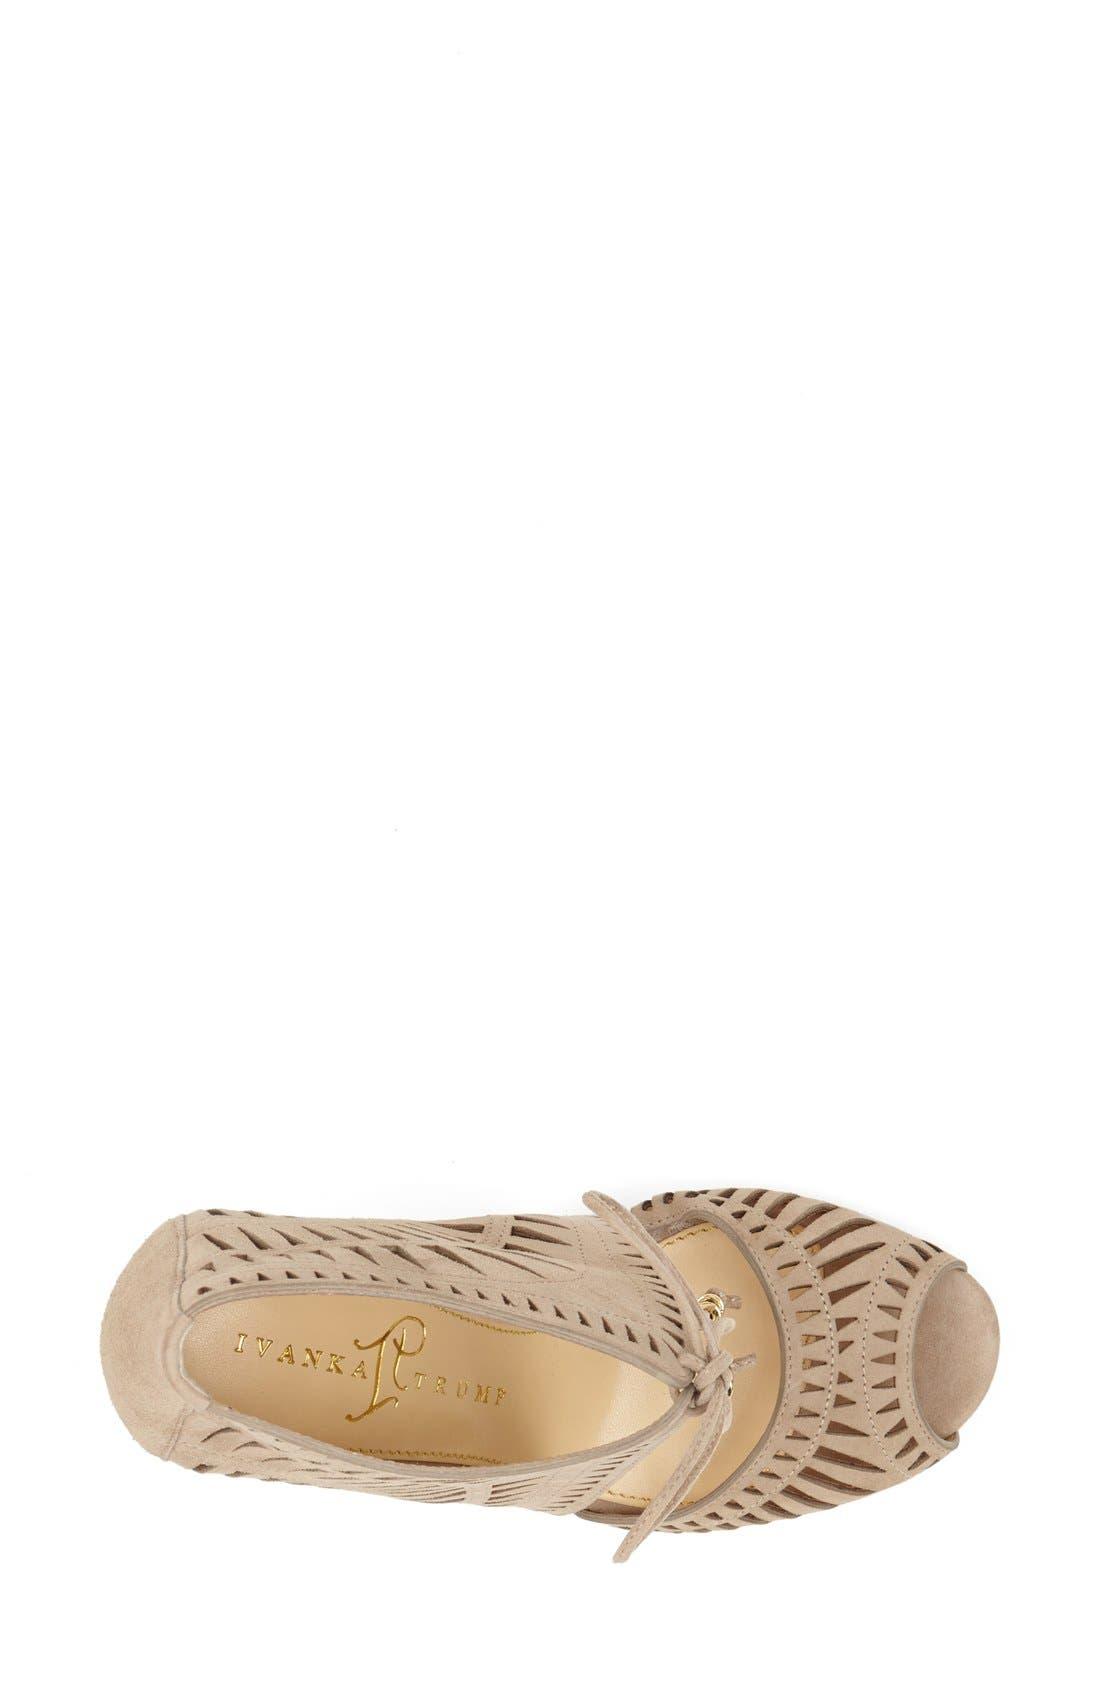 Alternate Image 3  - Ivanka Trump 'Delfino' Sandal